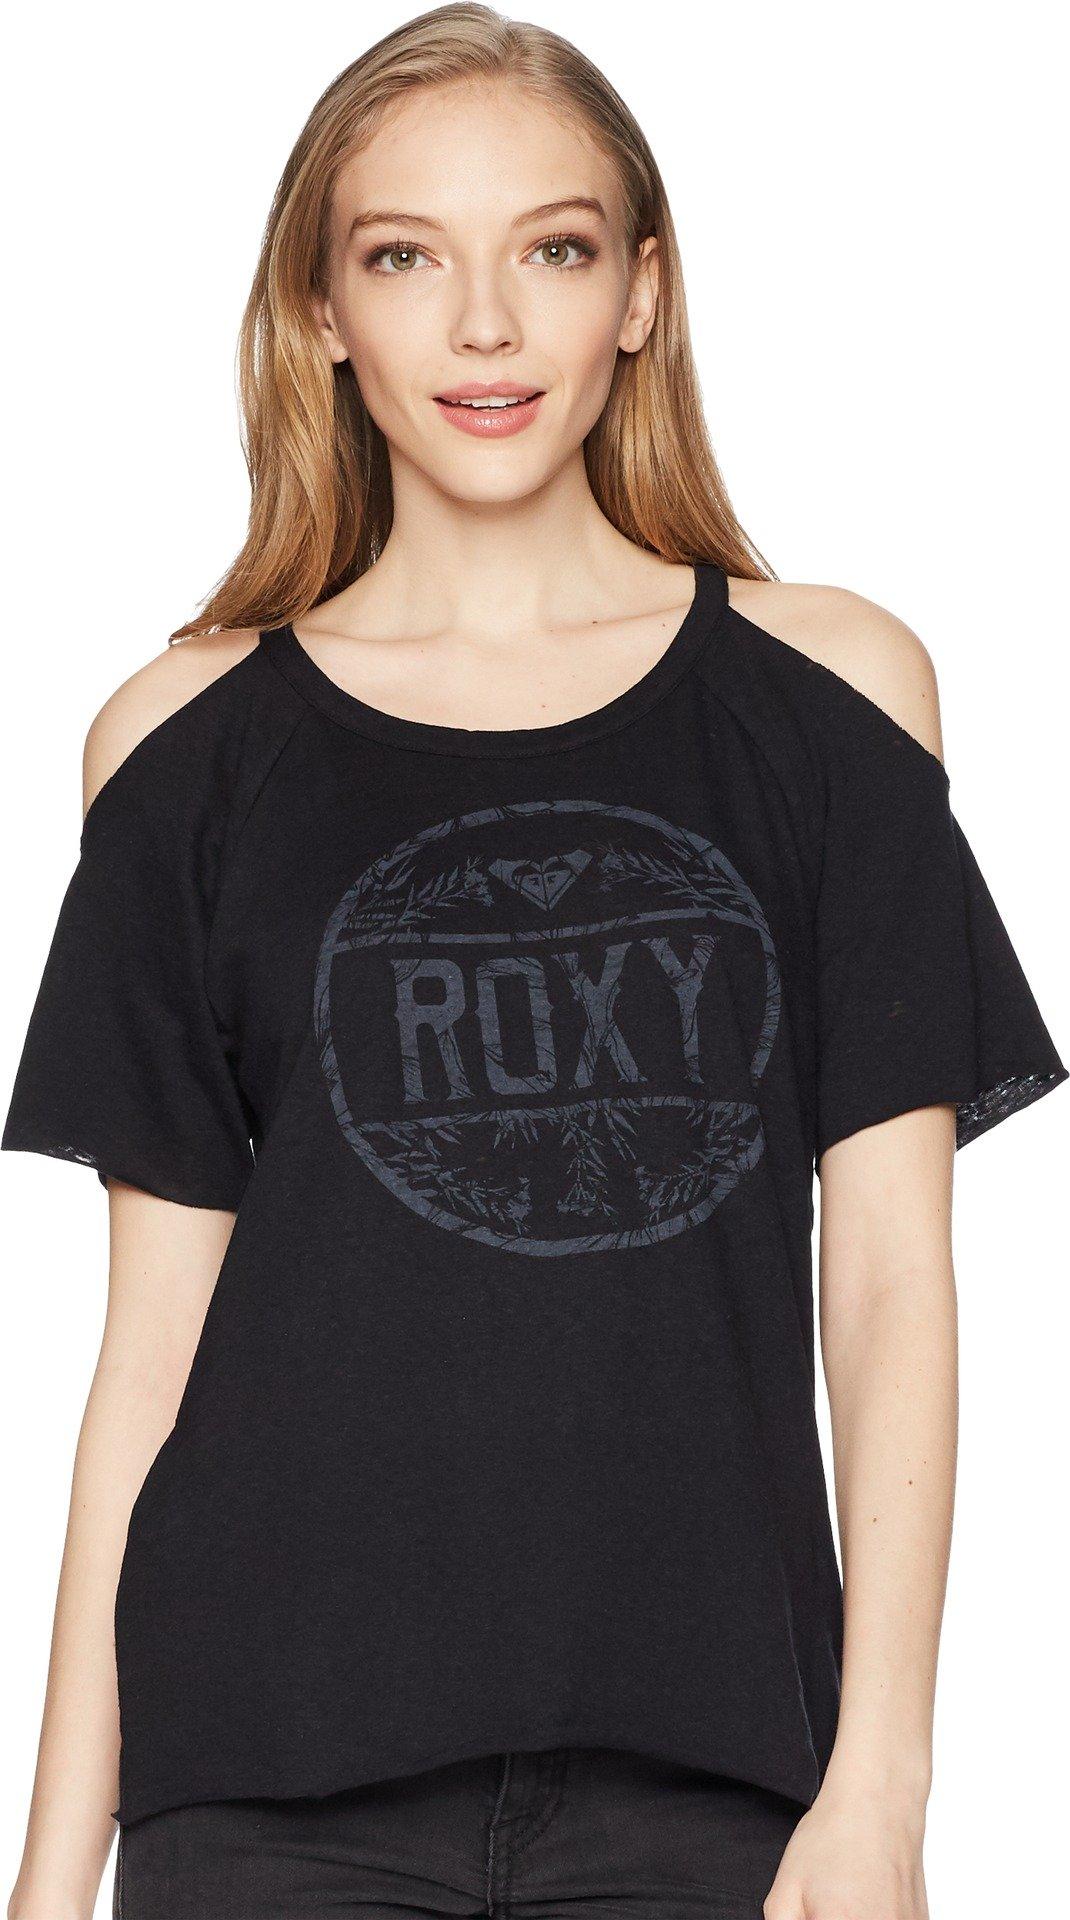 Roxy Junior's Luv Bug Shoulder Tee, Anthracite, XS